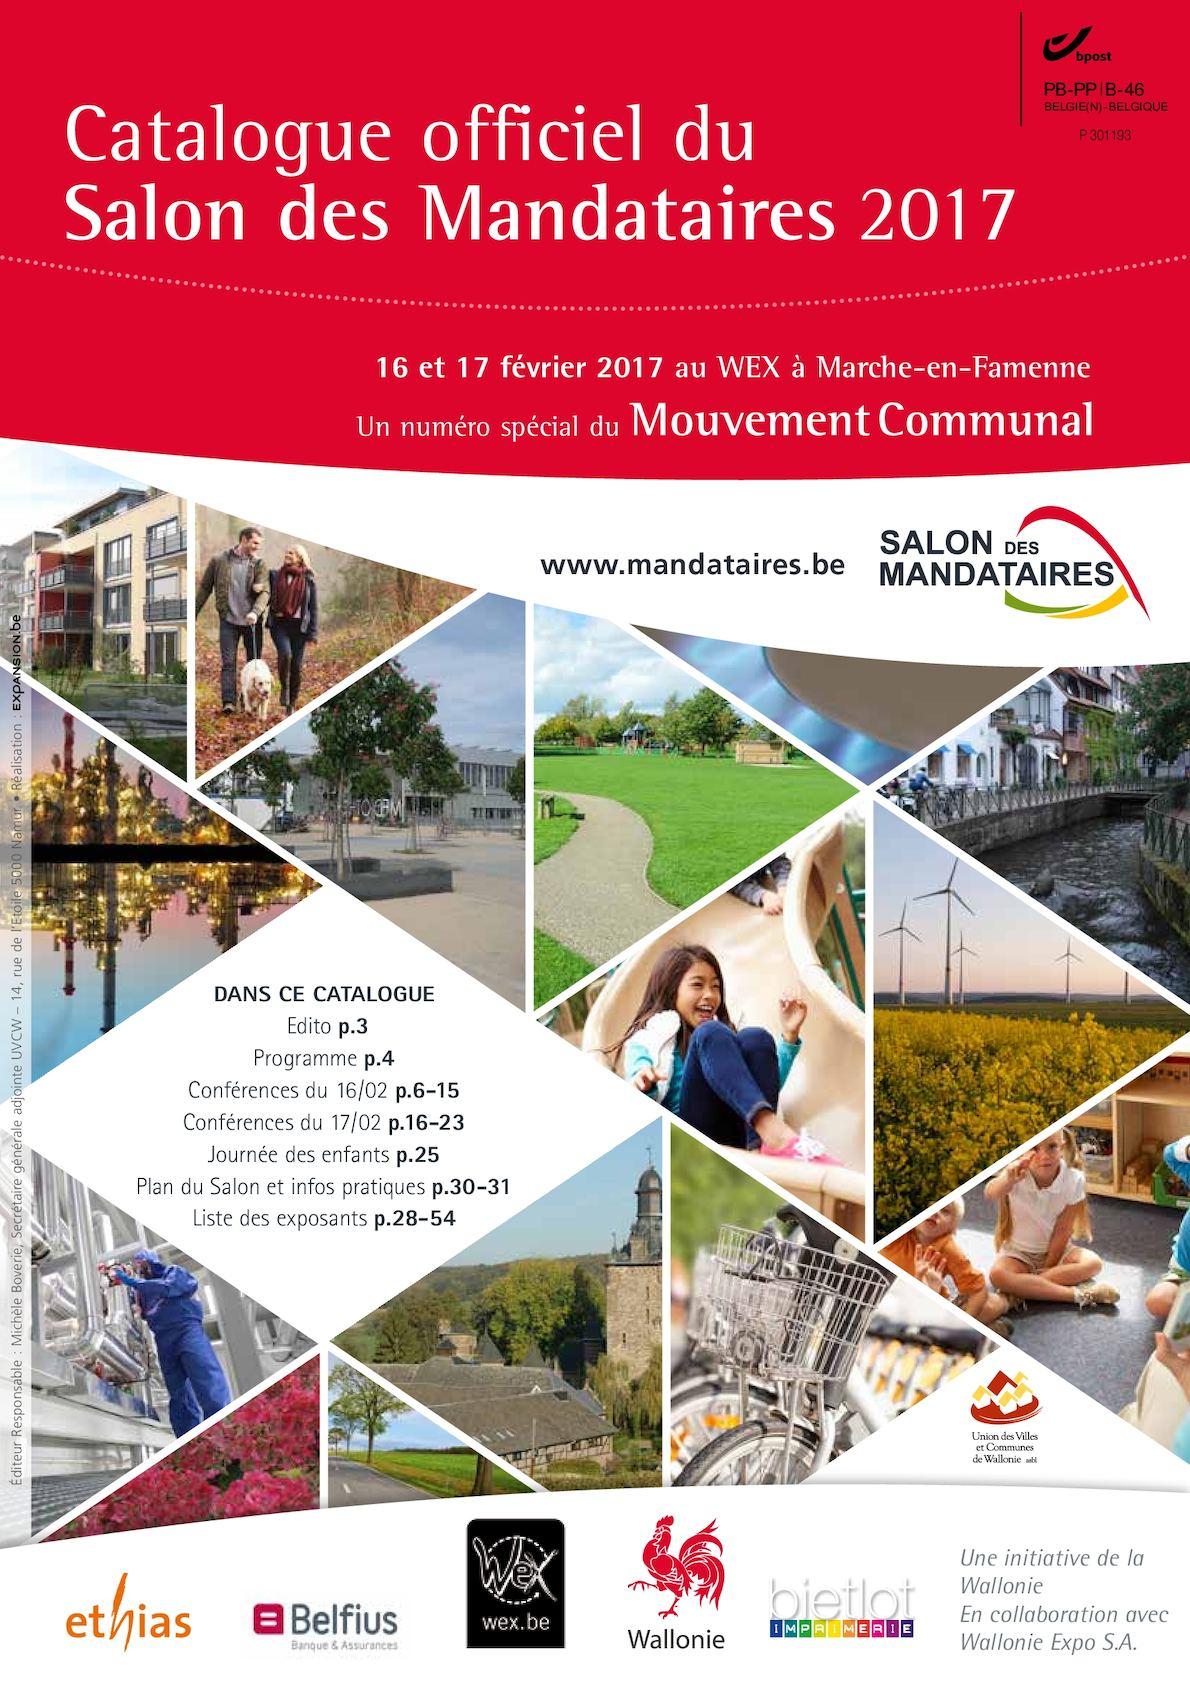 Salon Aluminium De Jardin Génial Calaméo Catalogue Salon Des Mandataires 2017 Of 35 Unique Salon Aluminium De Jardin